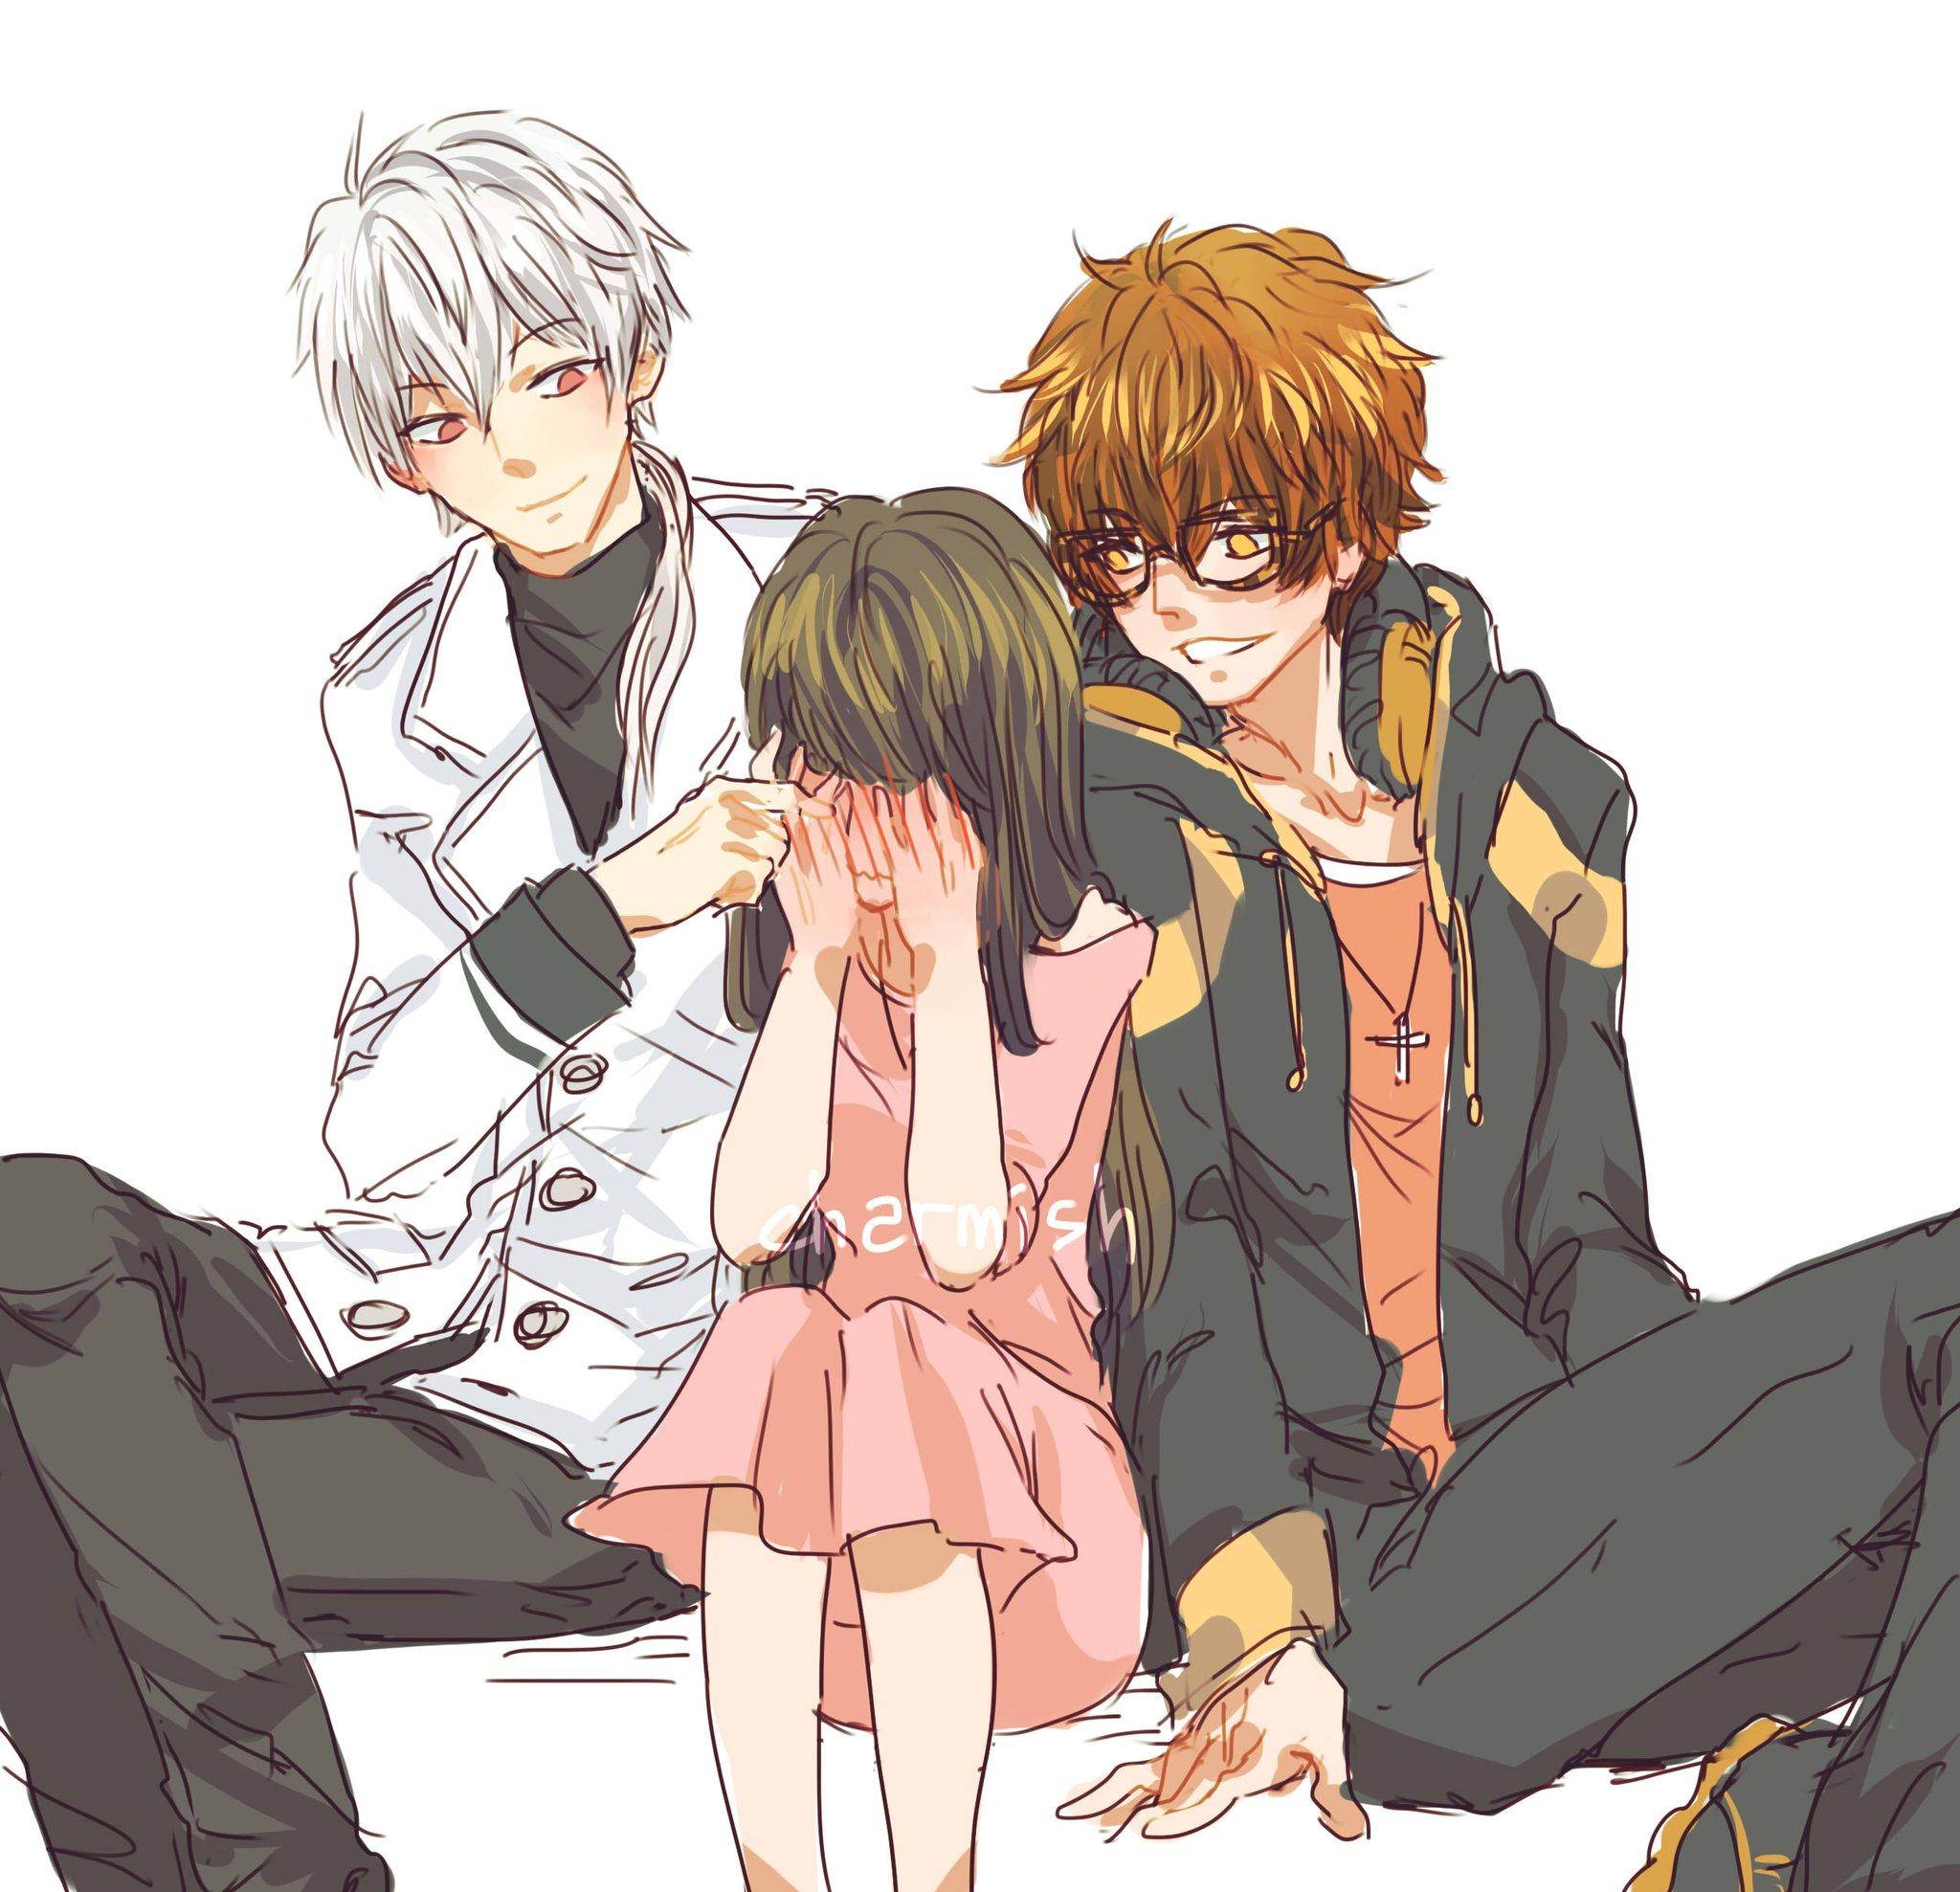 flirting games anime boy games list online